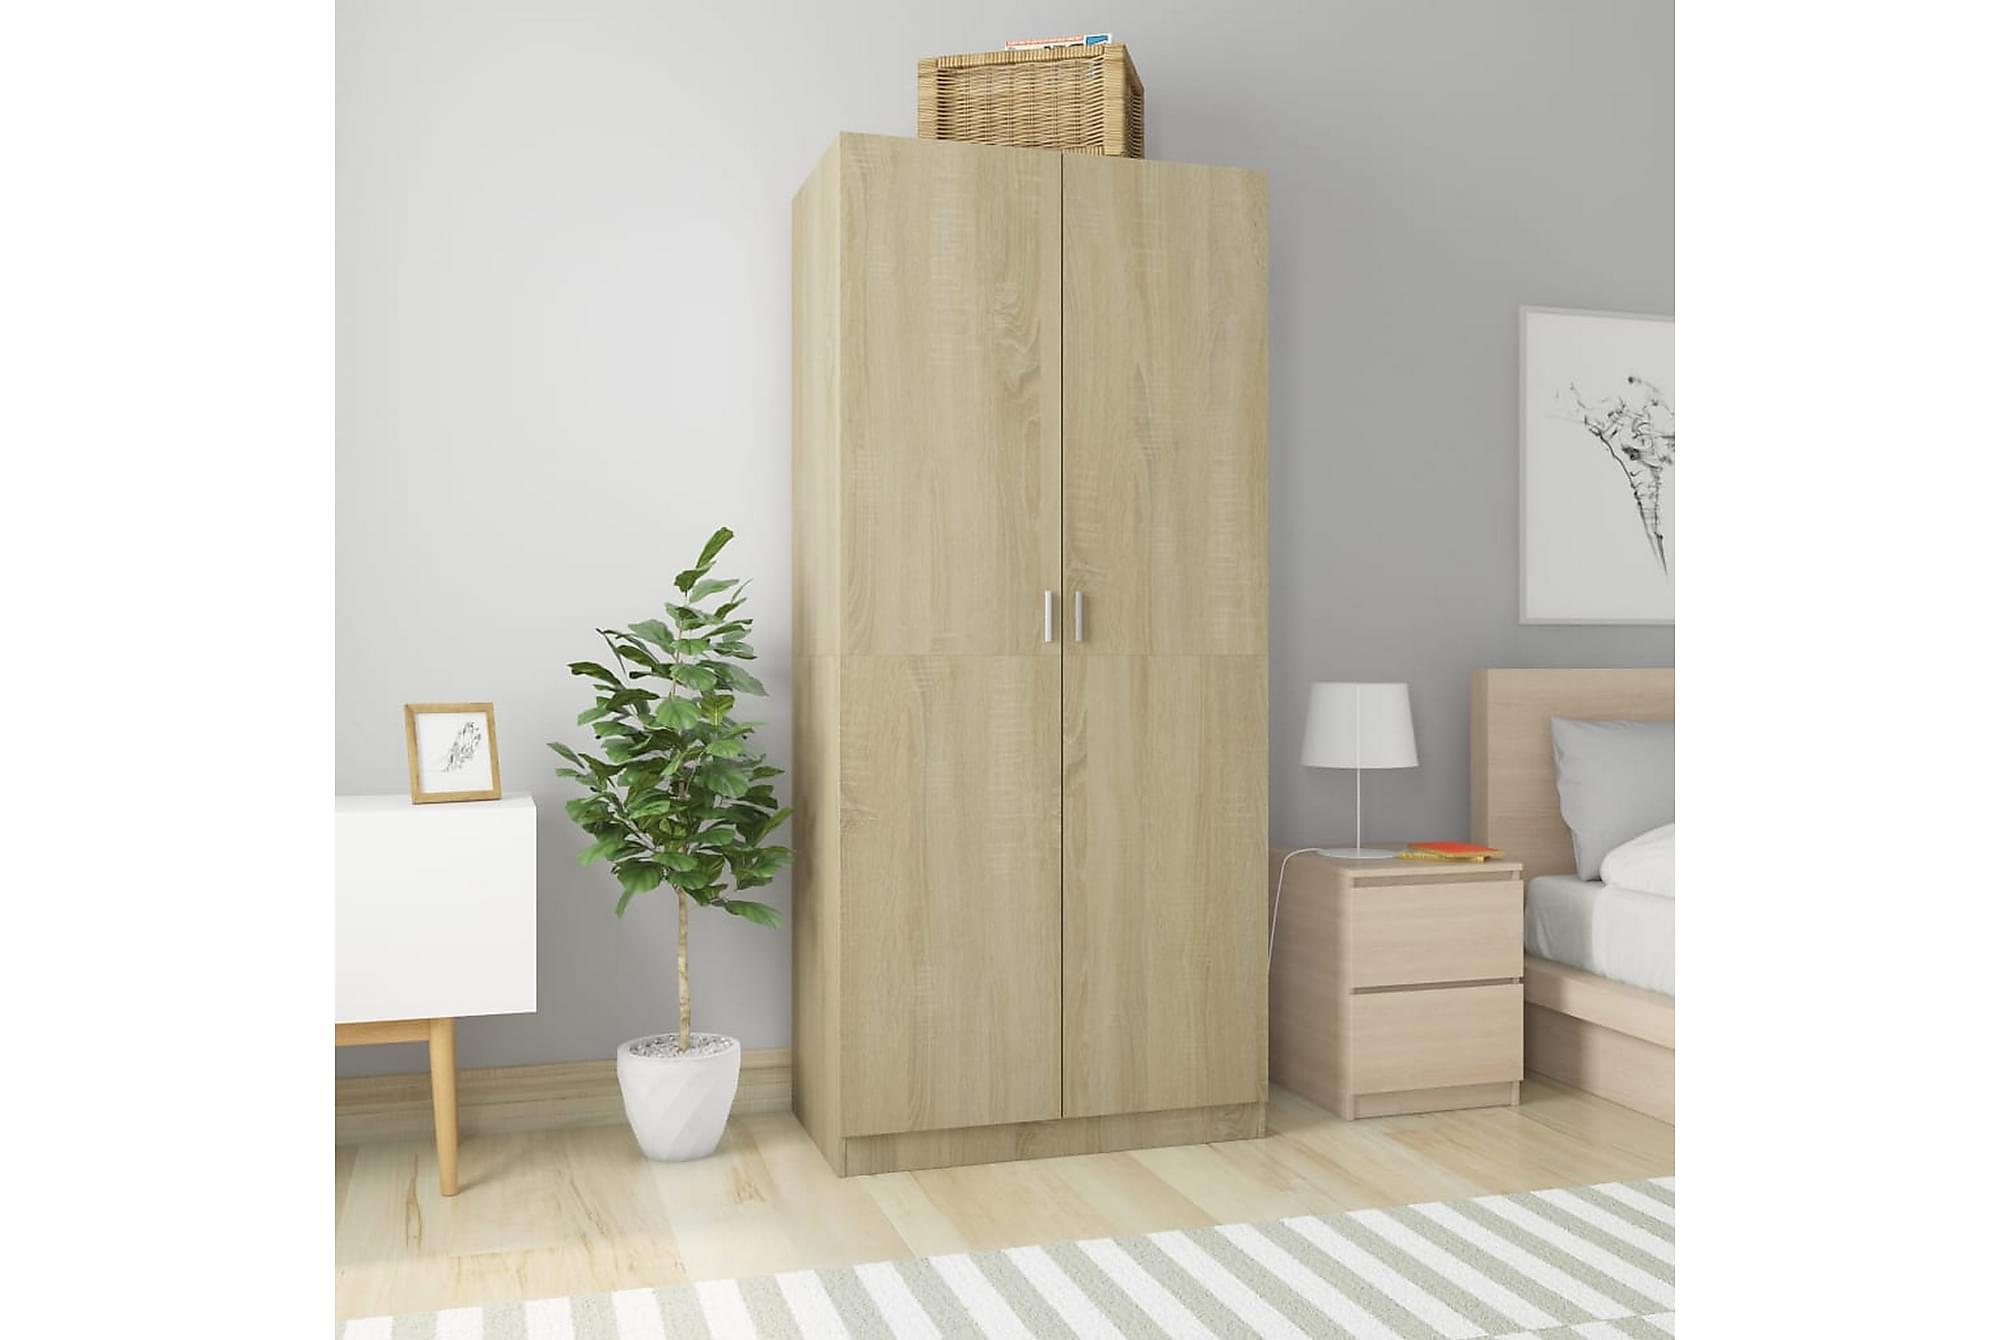 Garderob sonoma-ek 90x52x200 cm spånskiva